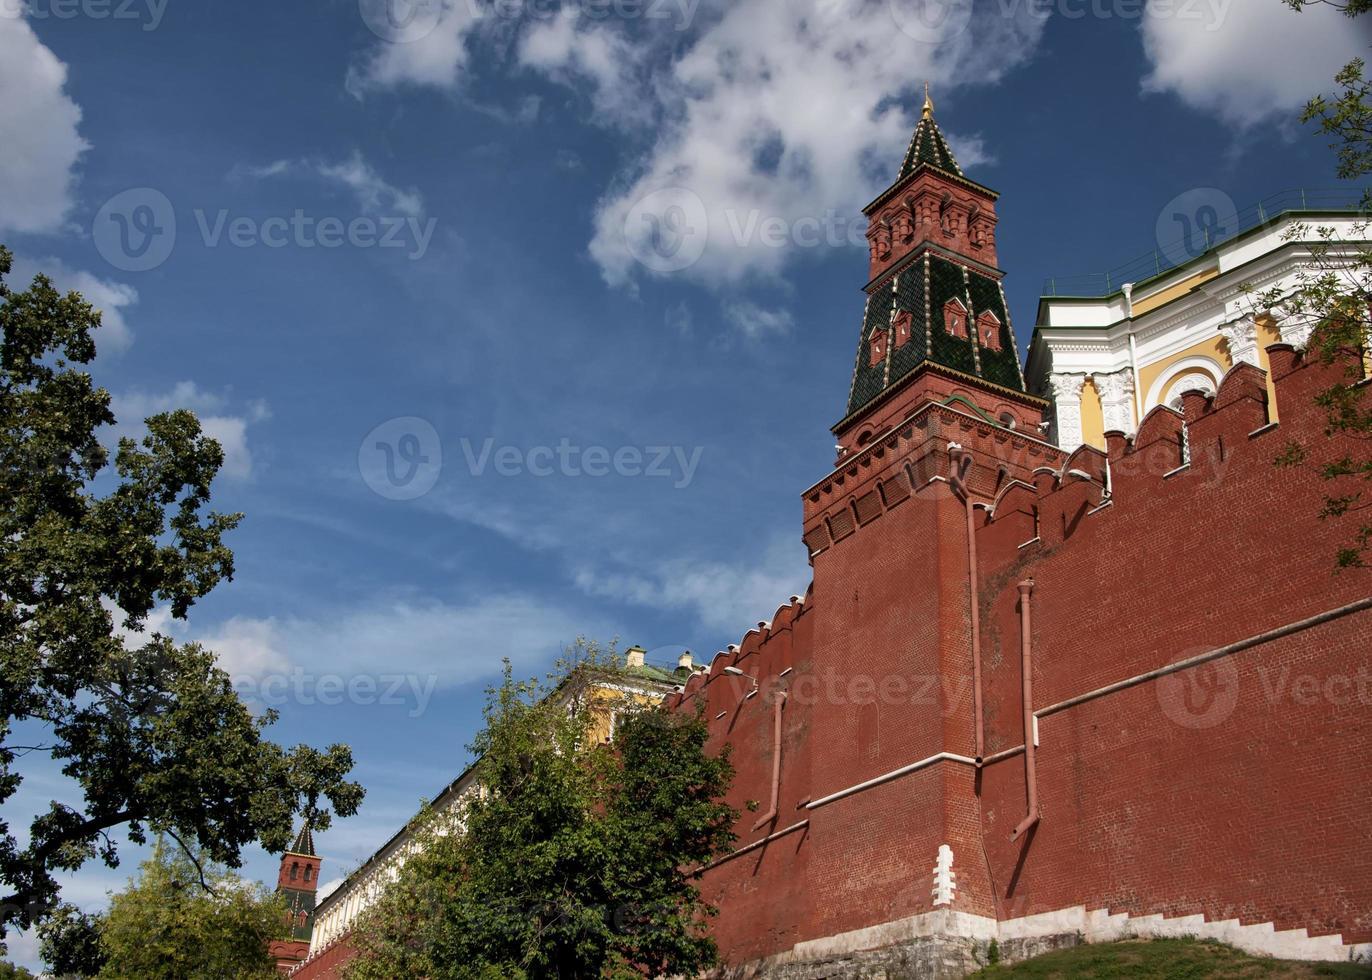 Ryssland, Moskva: rampart med kremlens torn. foto